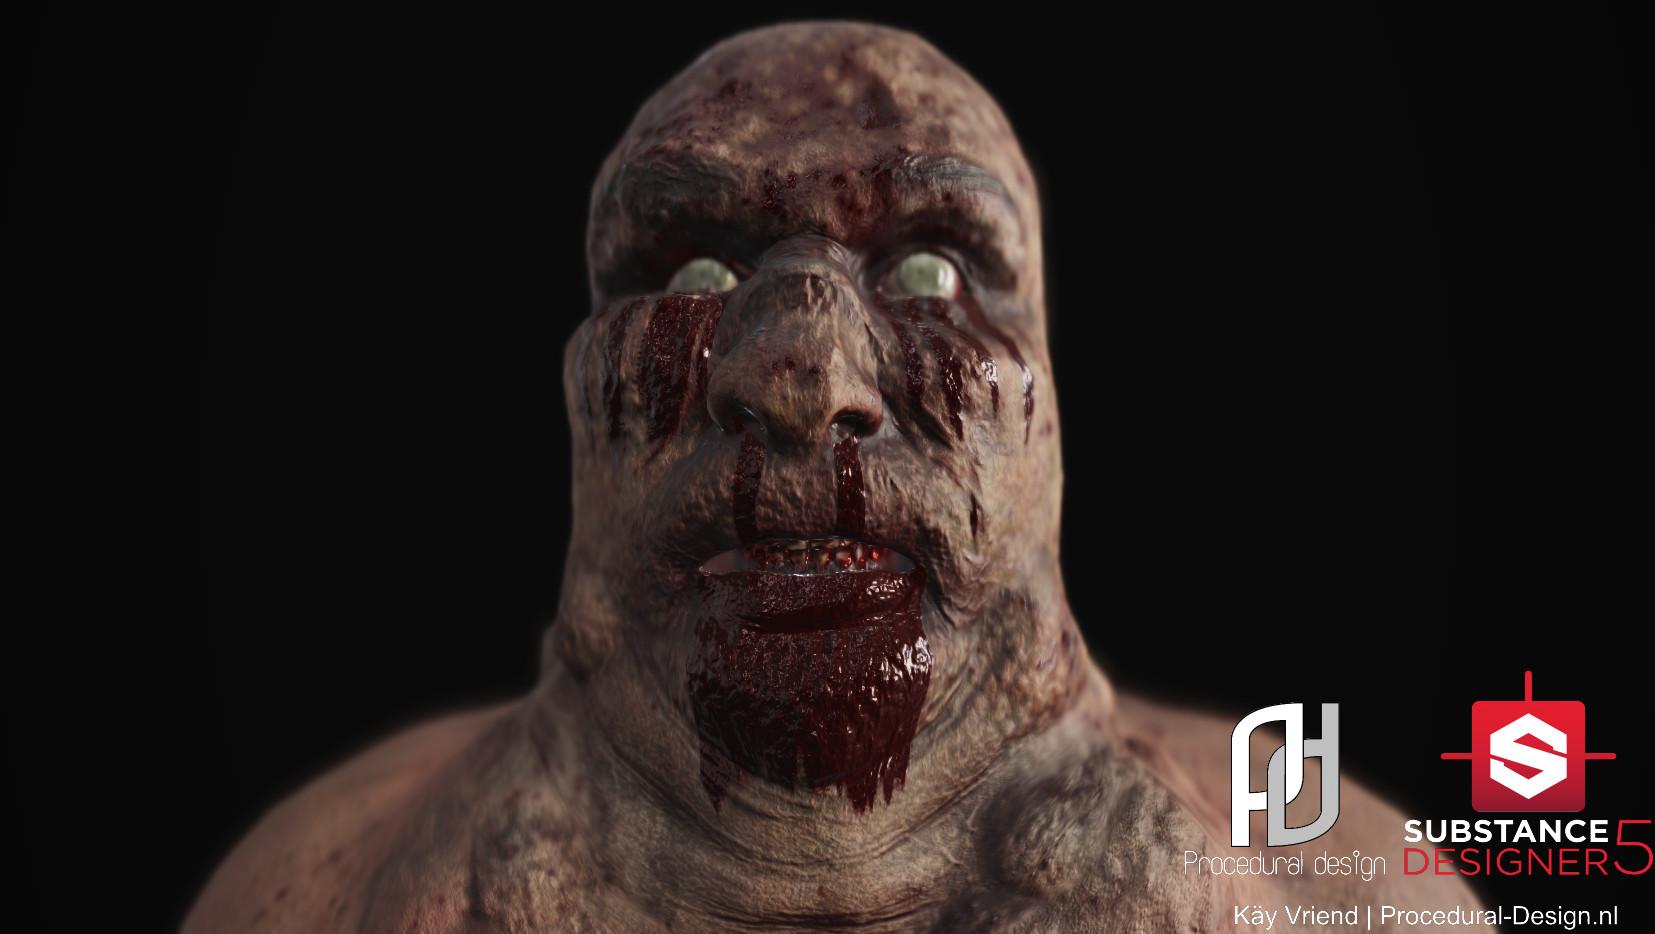 Kay vriend zombie 2